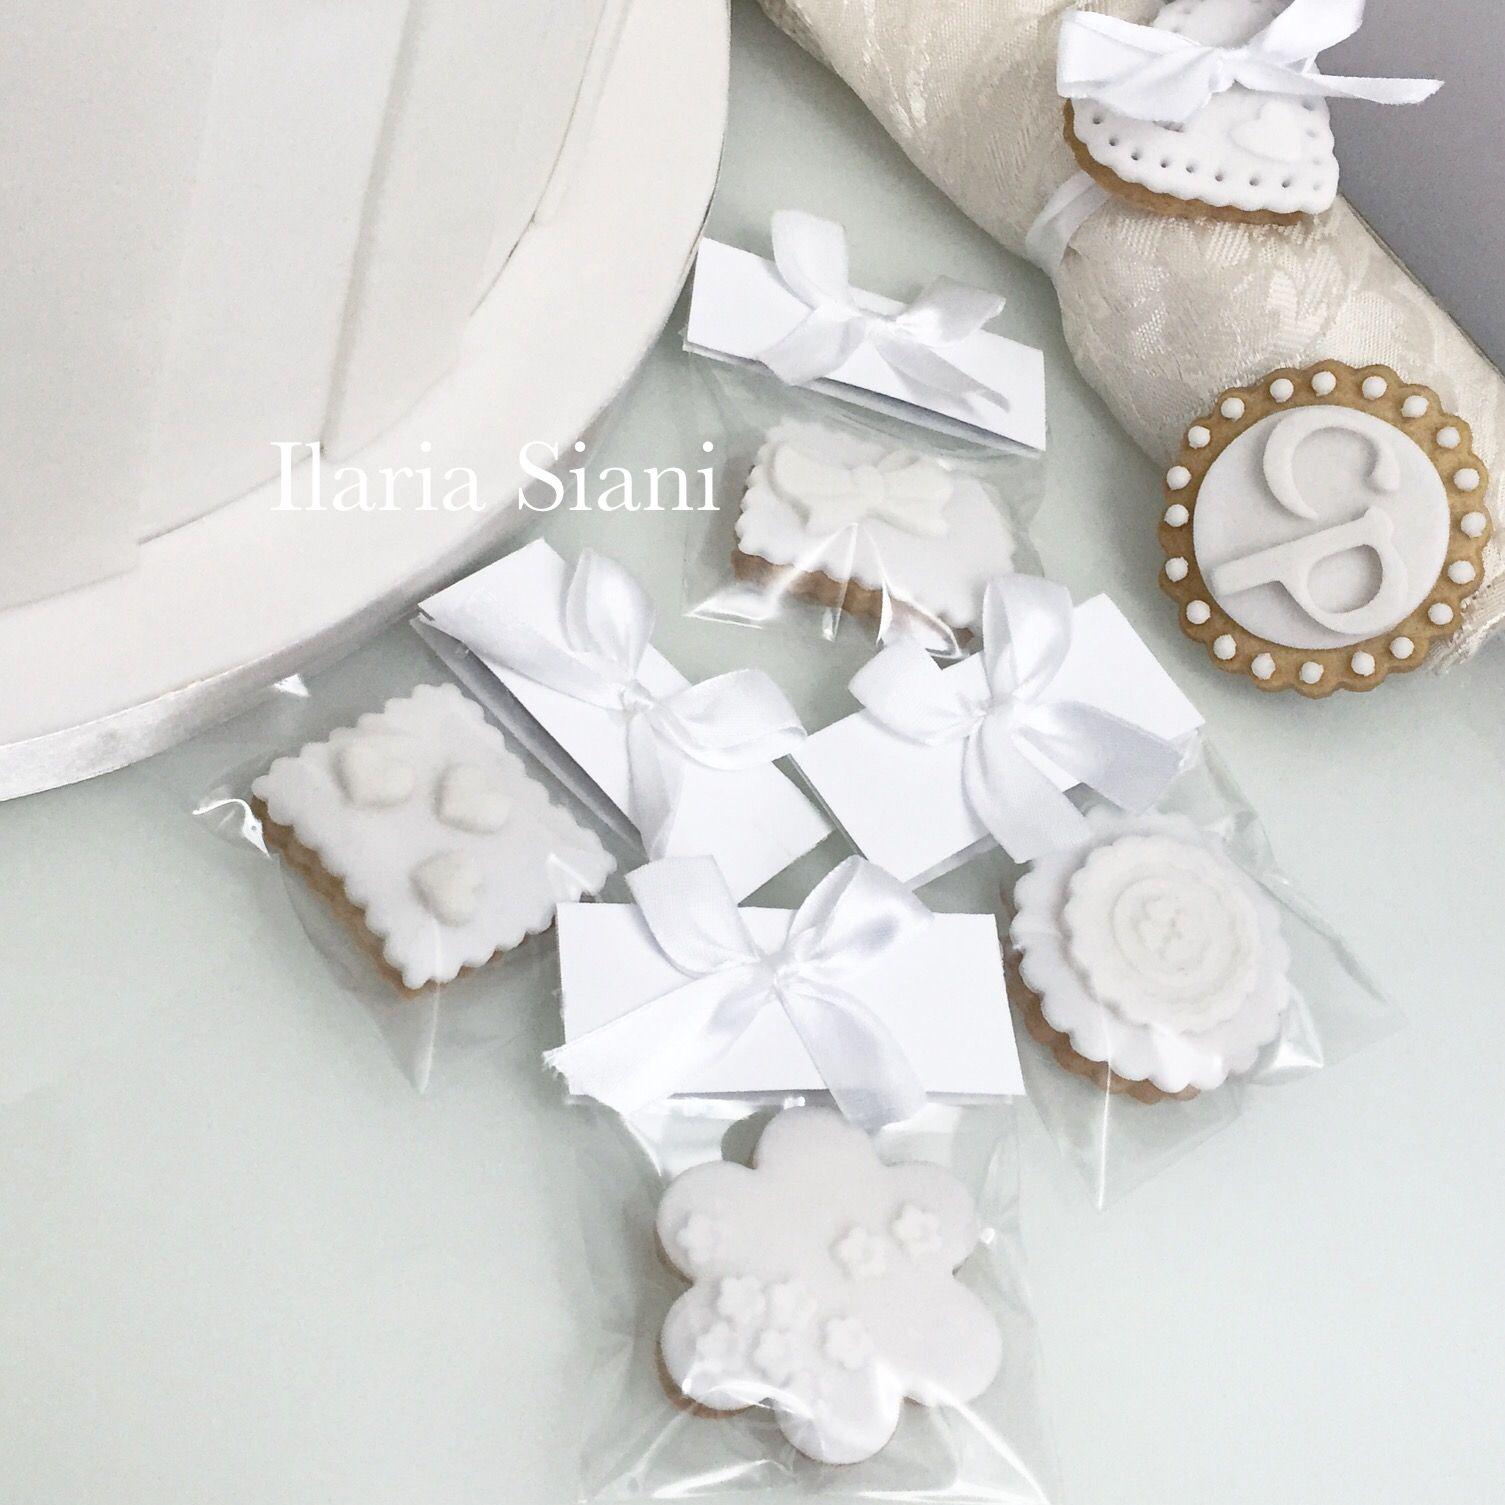 Segnaposto Matrimonio Total White.Biscottini Segnaposto Per Un Matrimonio Total White